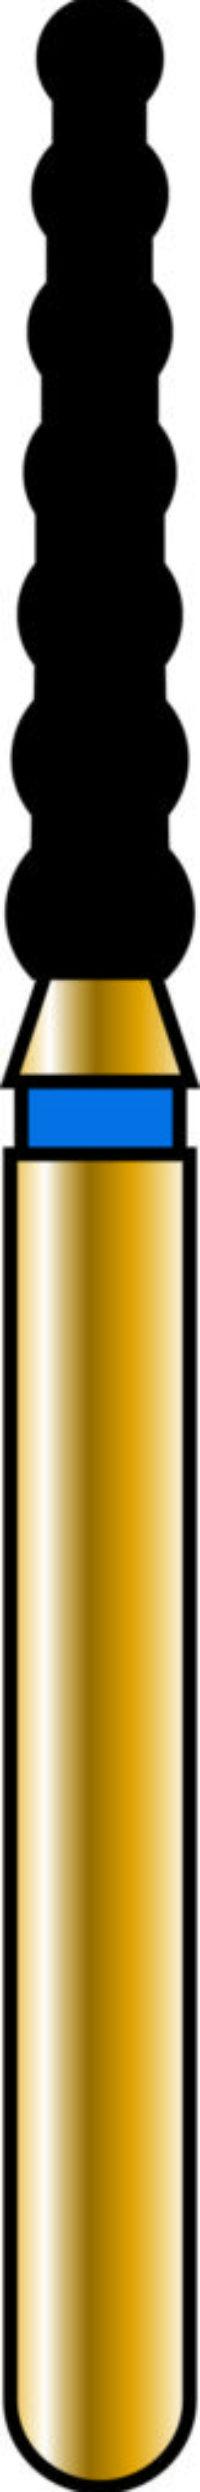 Cylinder 18-8mm Gold Diamond Bur